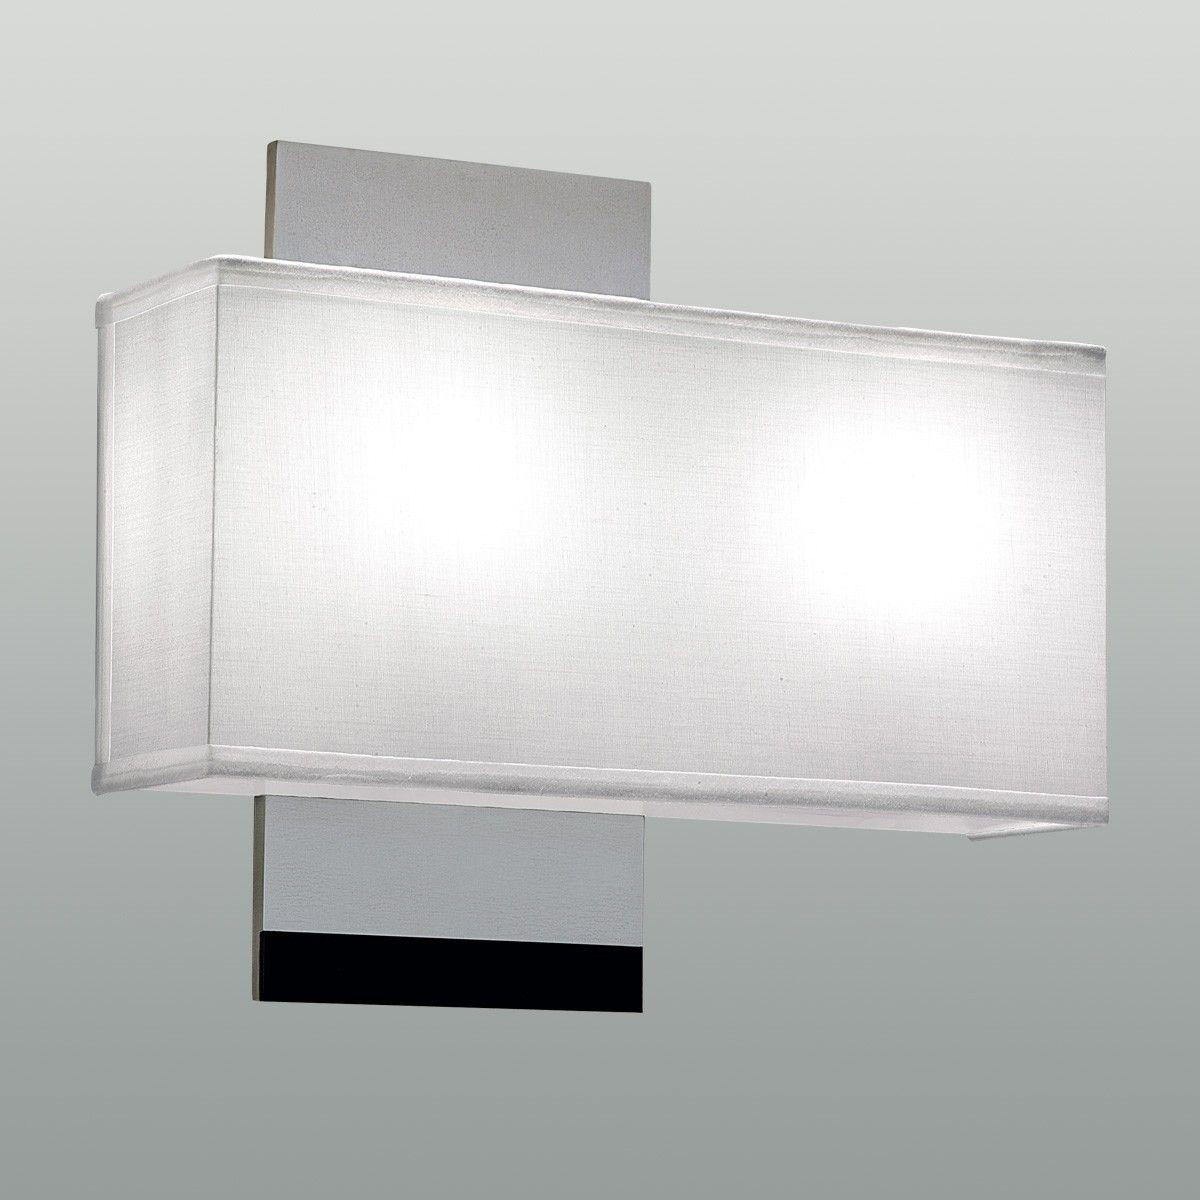 ilex architecural lighting soho double ada sconce  lighting  - ilex architecural lighting soho double ada sconce